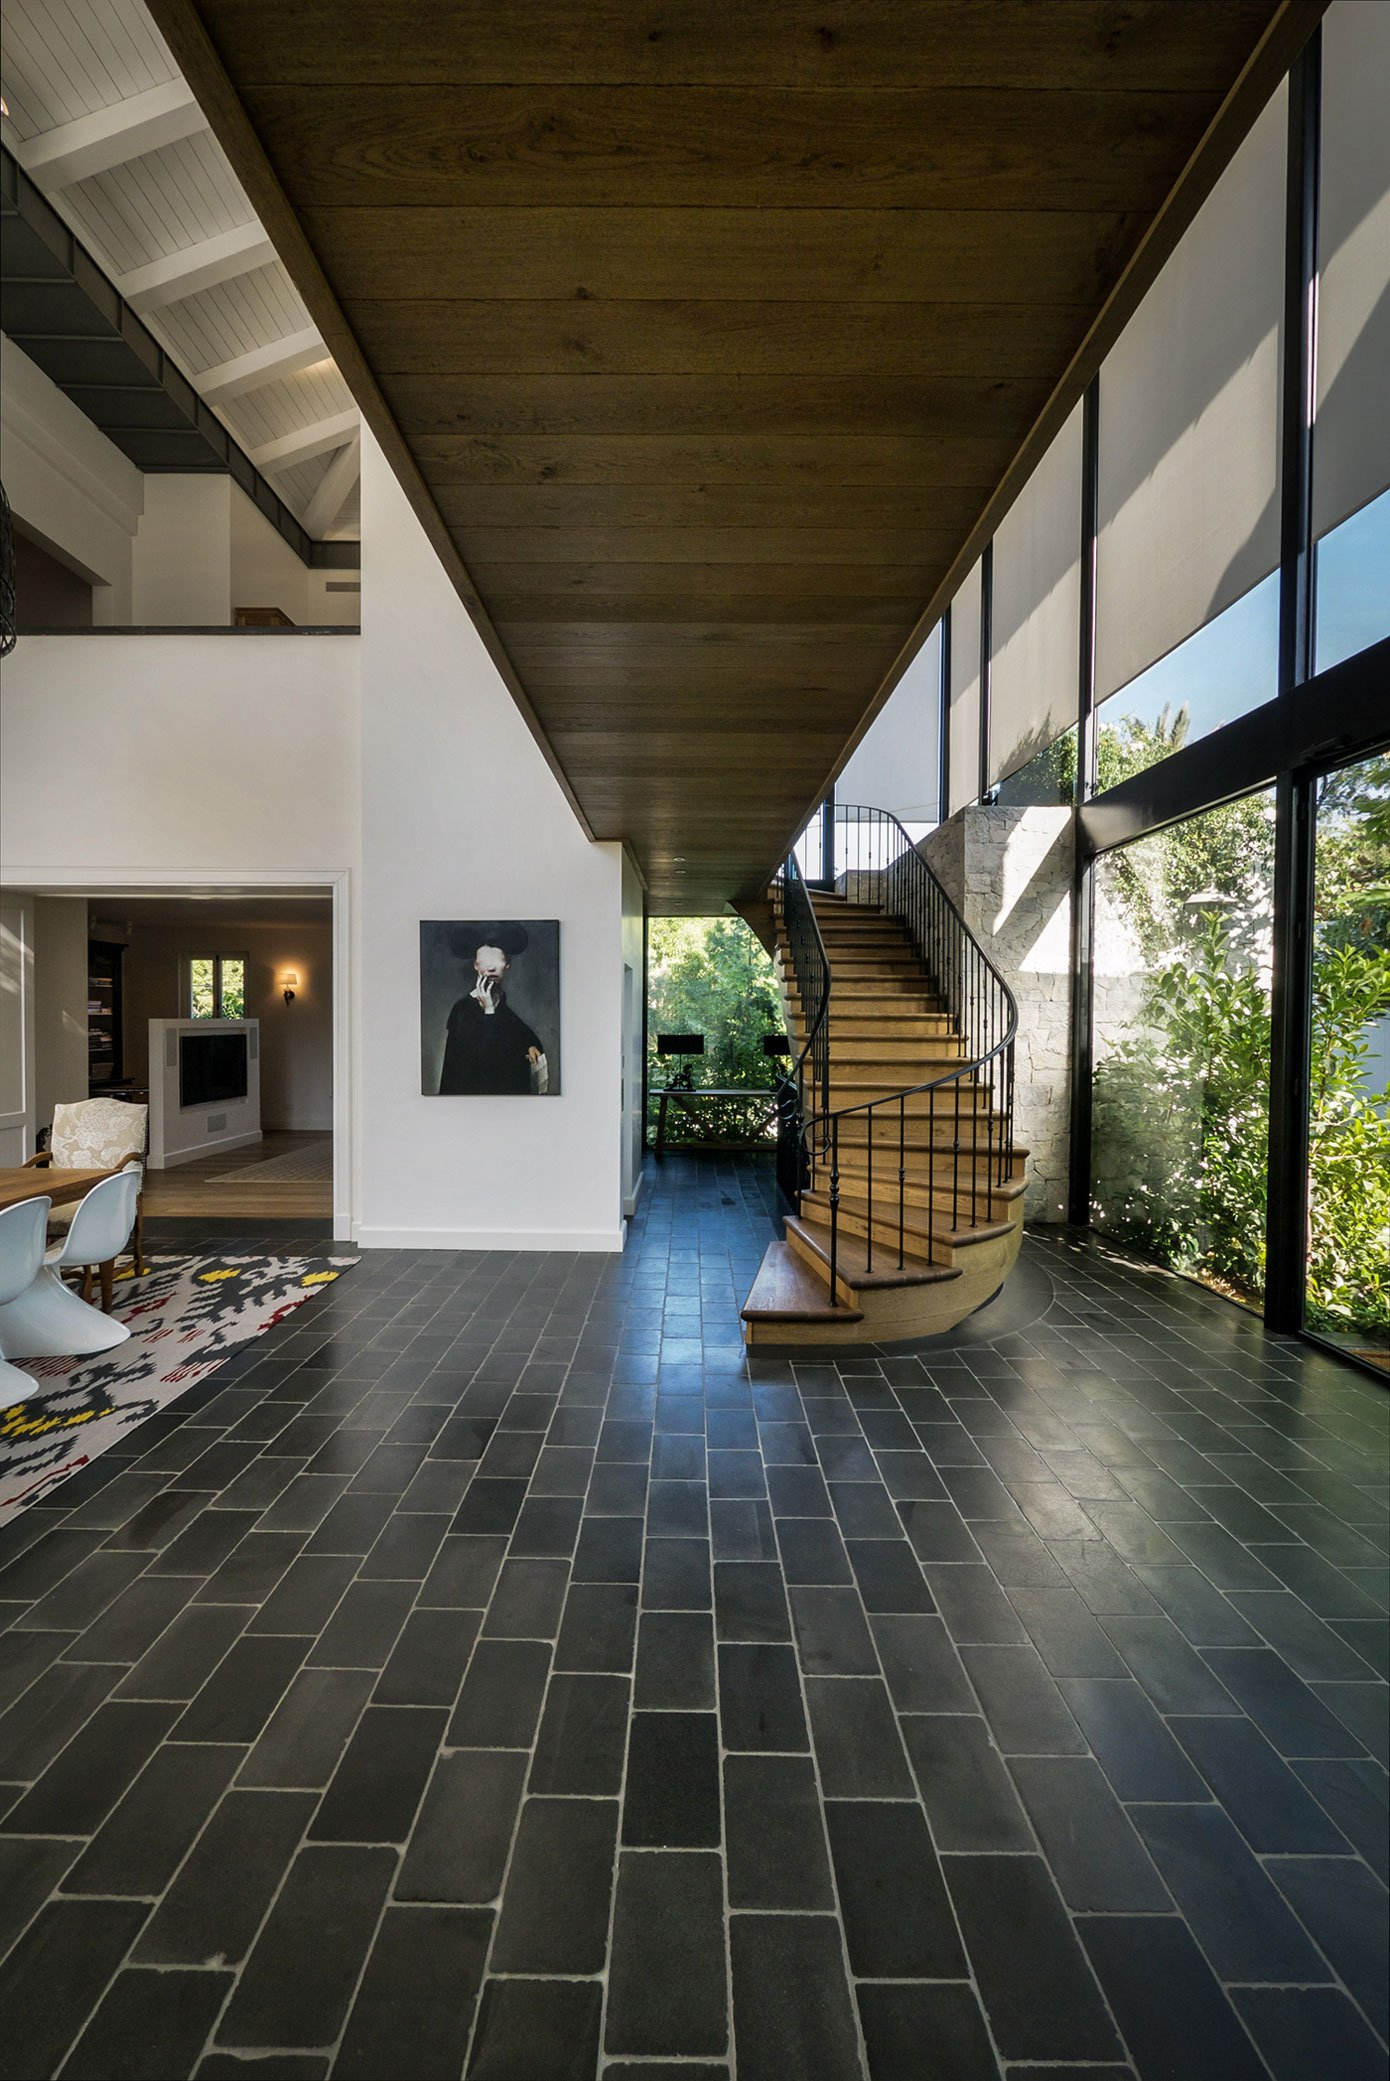 Home-in-Herzlia-Pituach-13